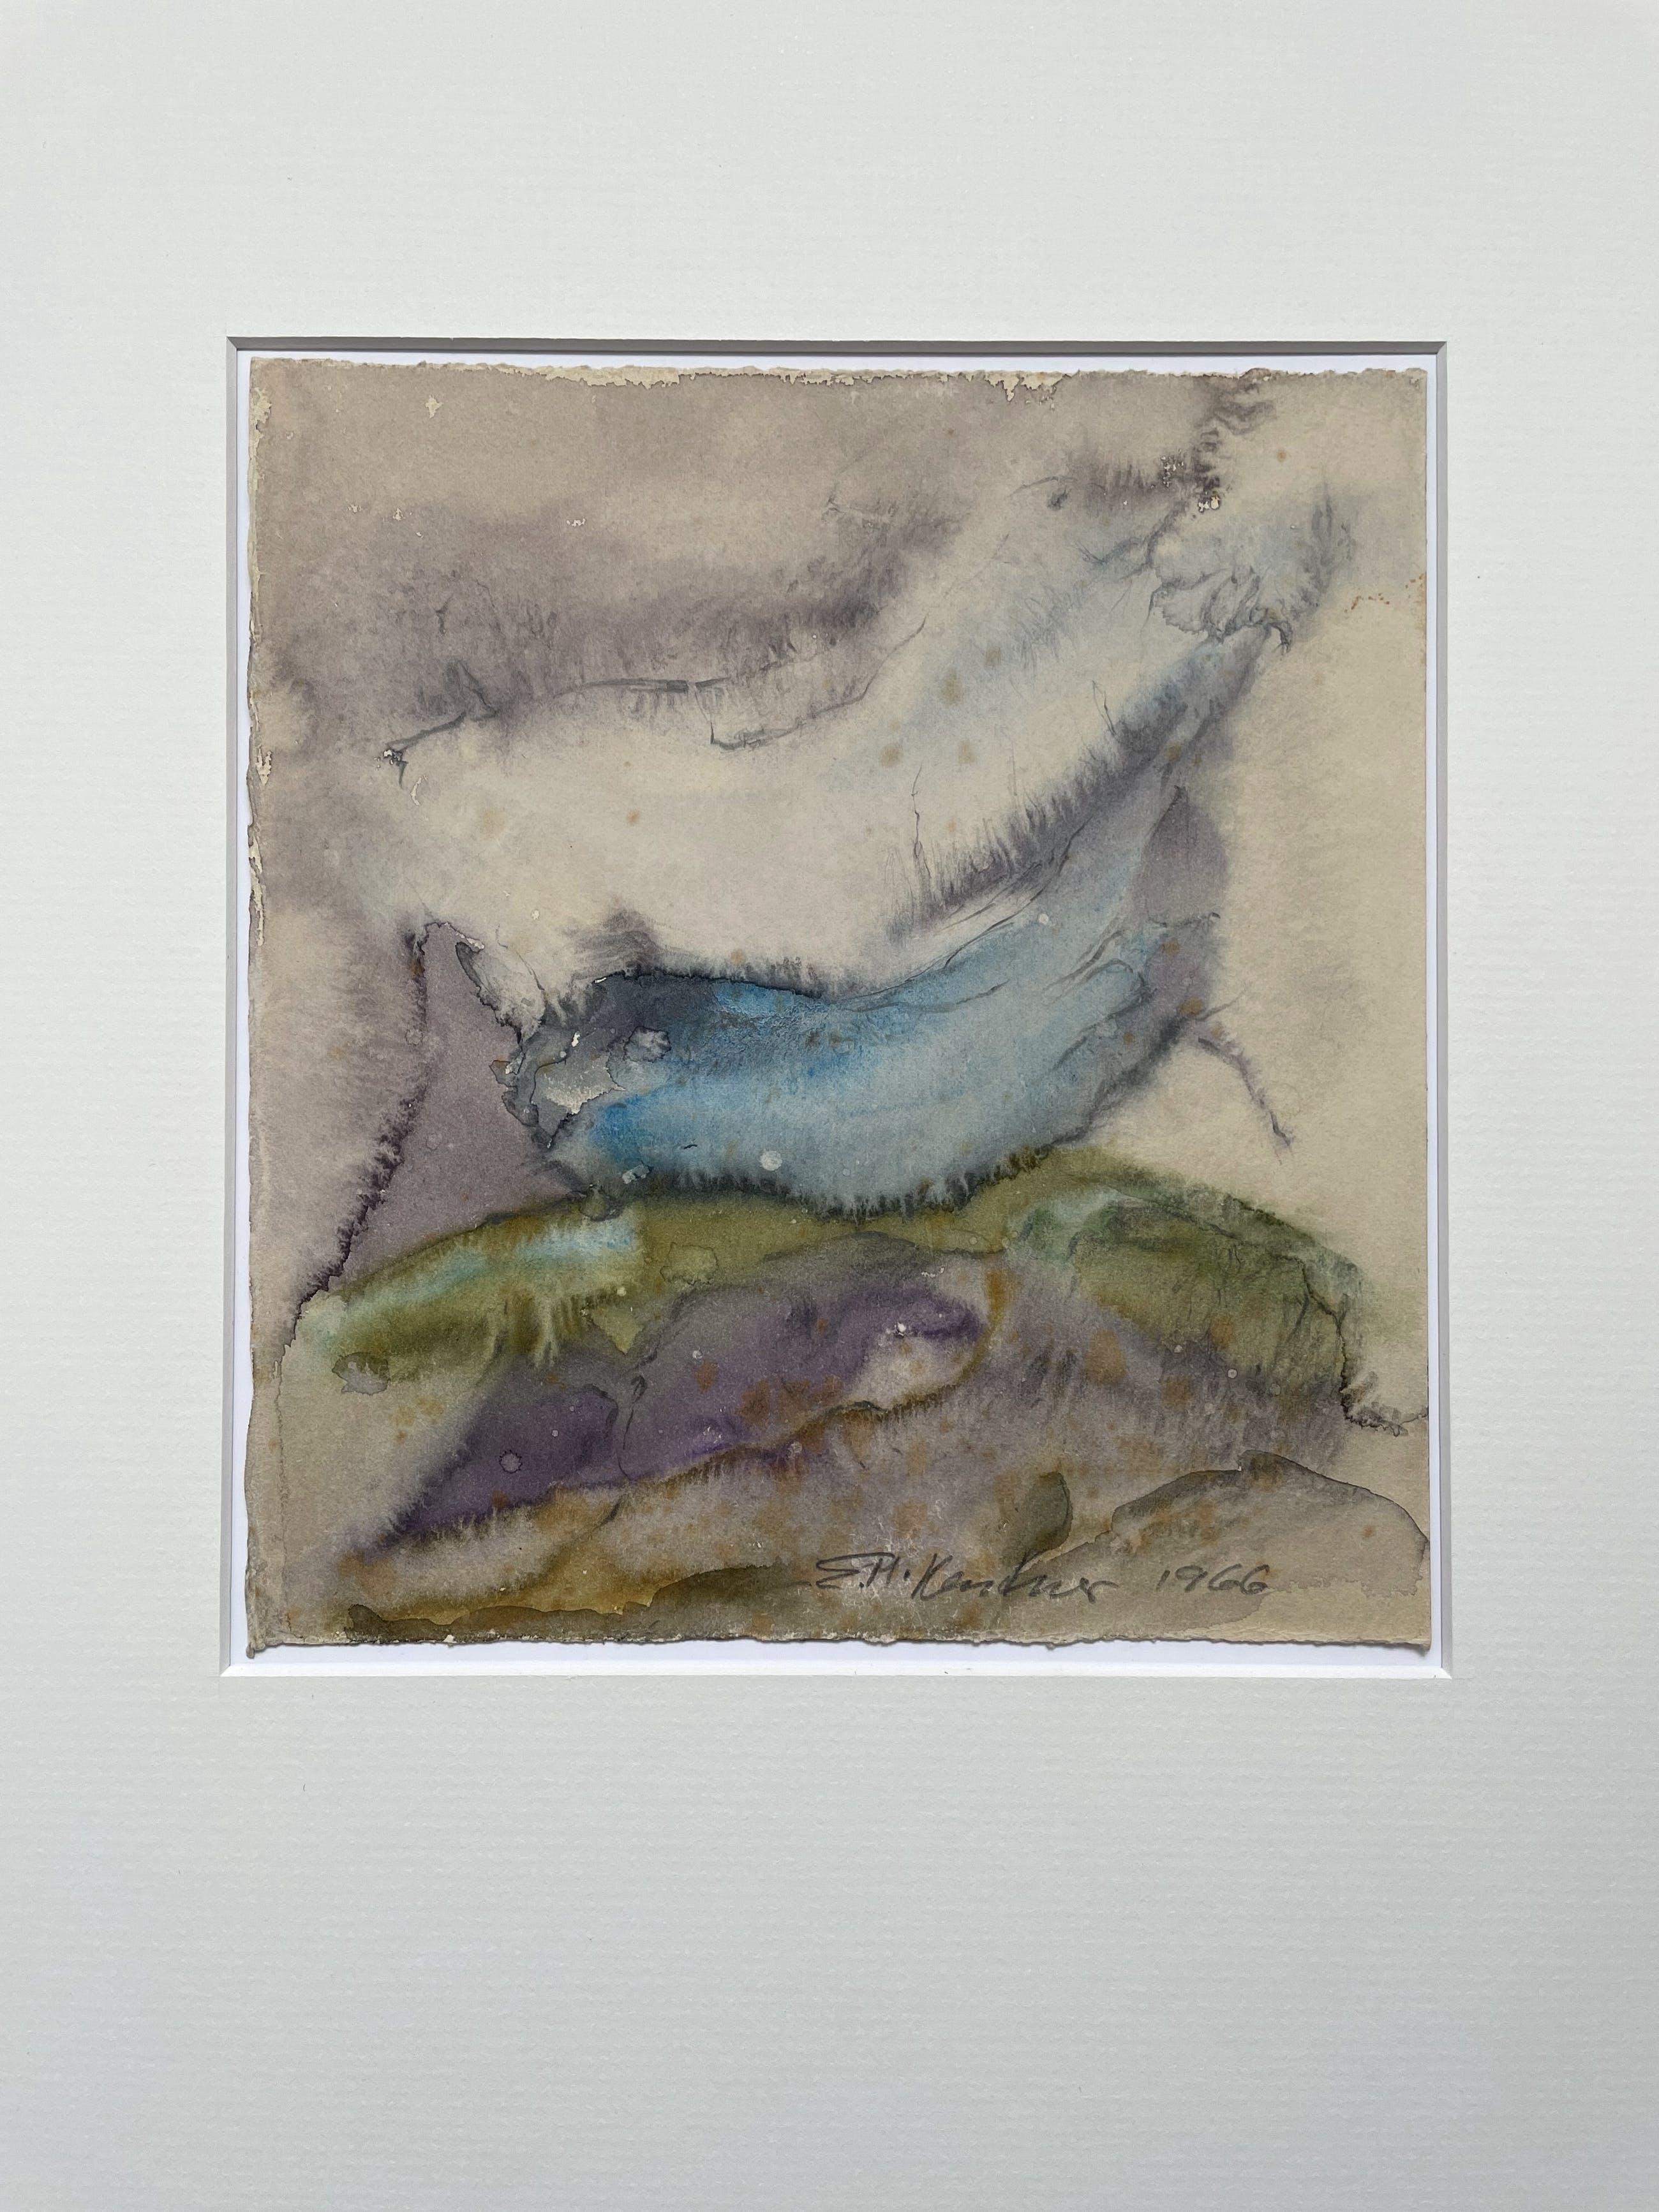 Eva Maria Kentner - Aquarell, frühe abstrahierte Landschaft auf Bütten, UNIKAT handsigniert kopen? Bied vanaf 50!